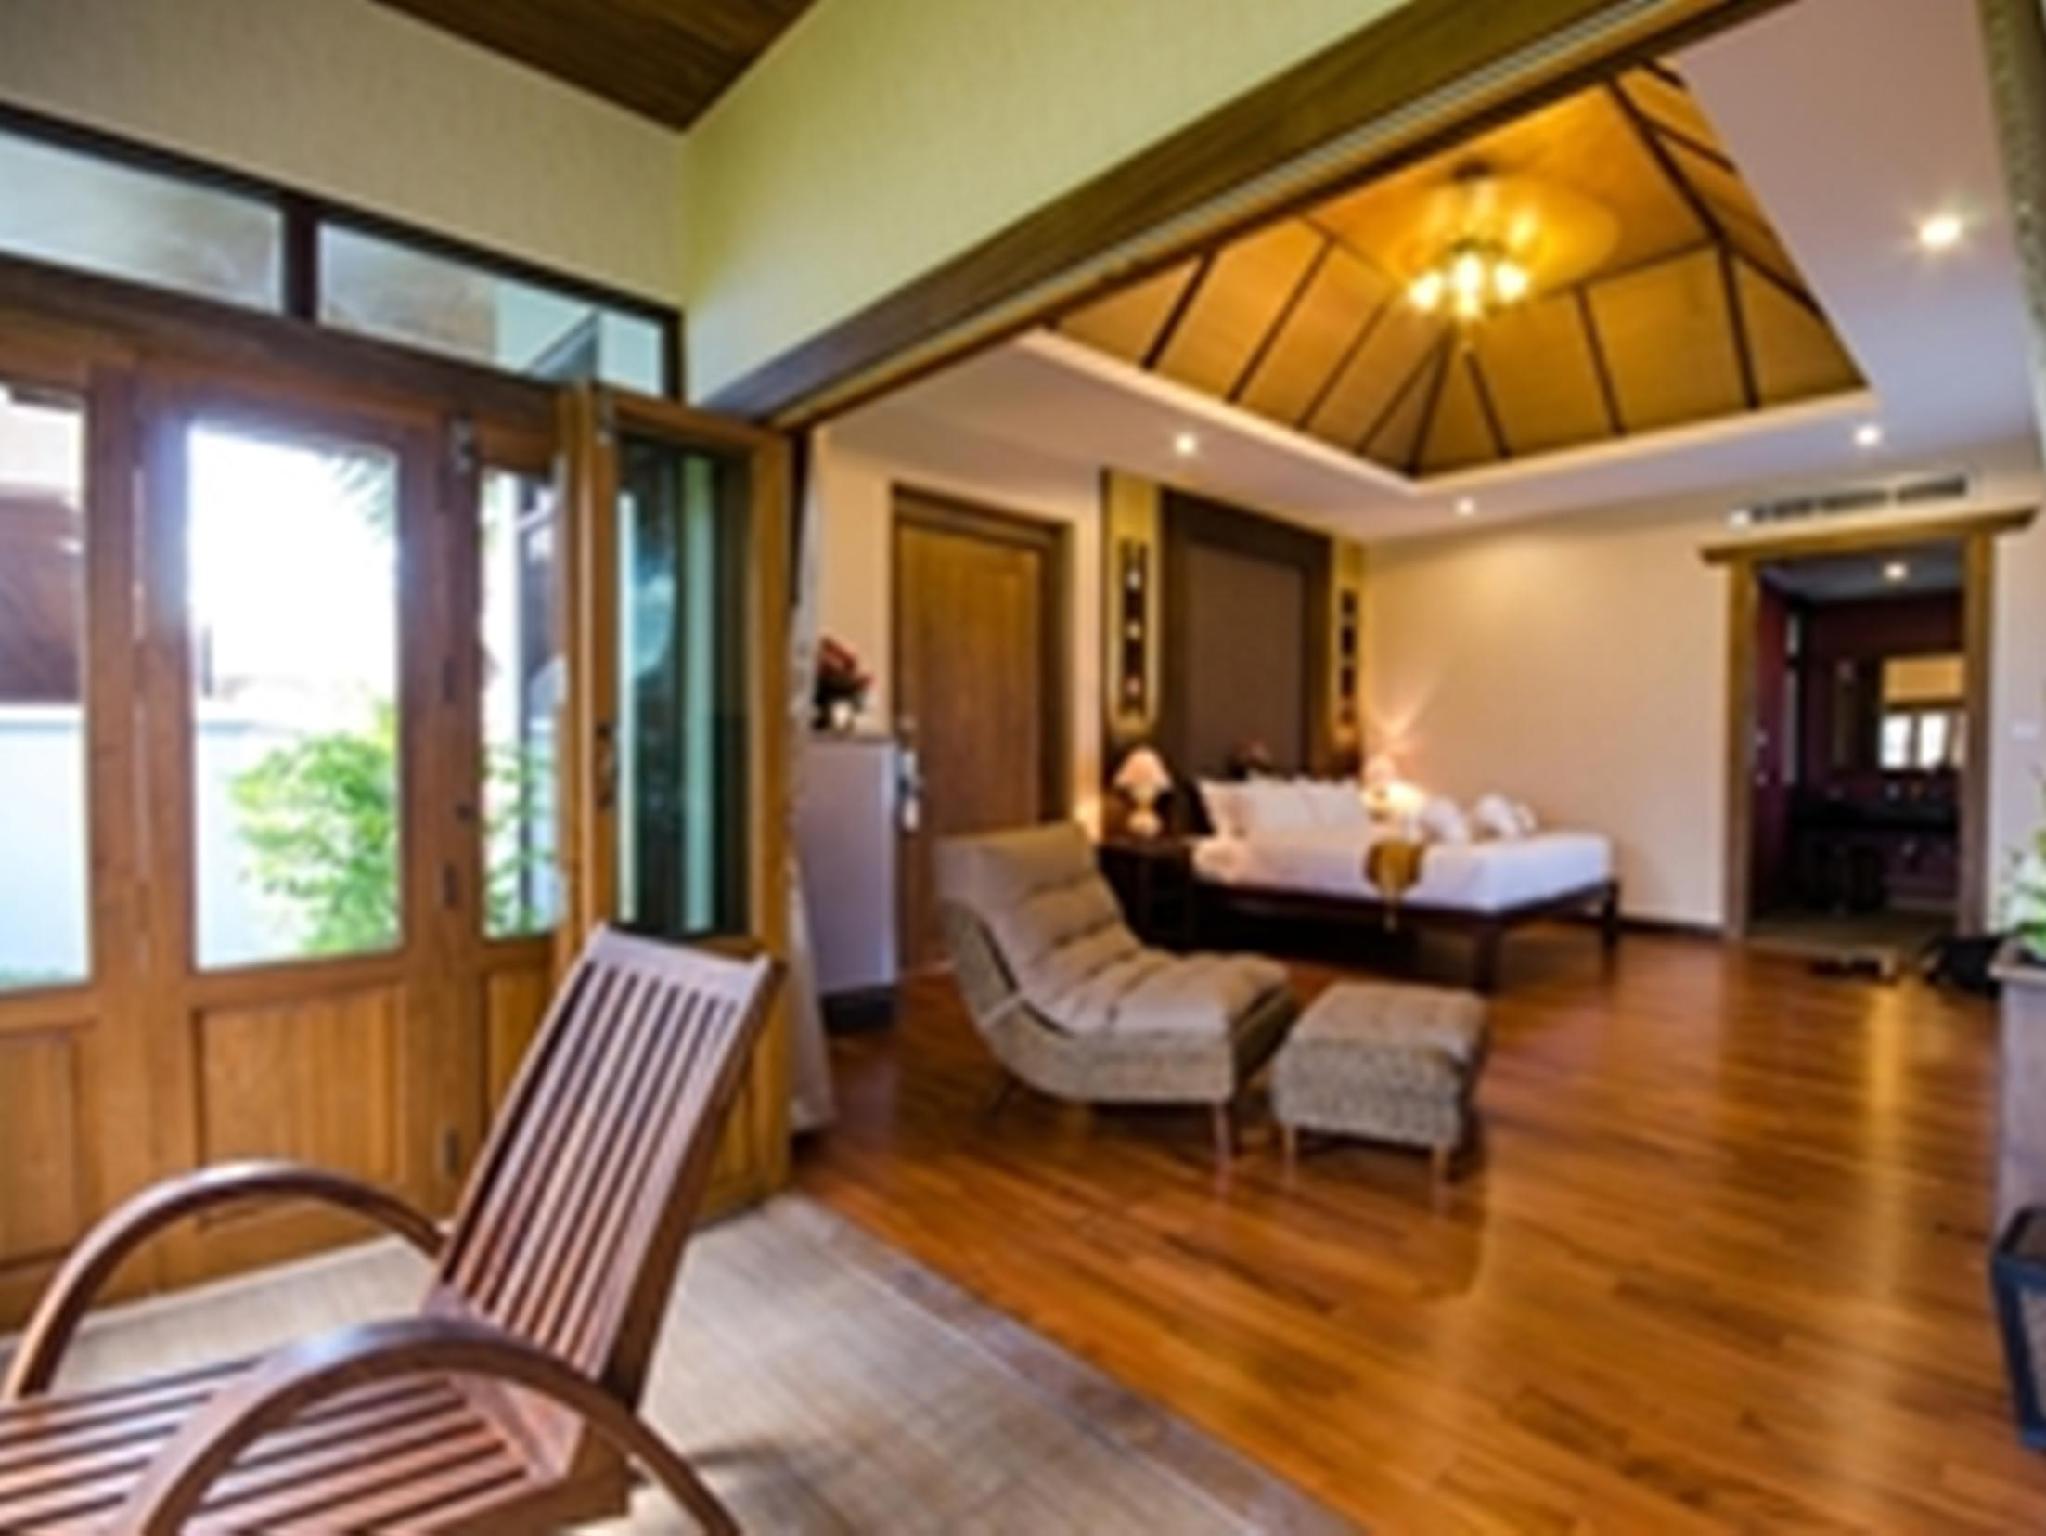 Khammon Lanna Resort,คำม่อน ล้านนา รีสอร์ท เชียงใหม่